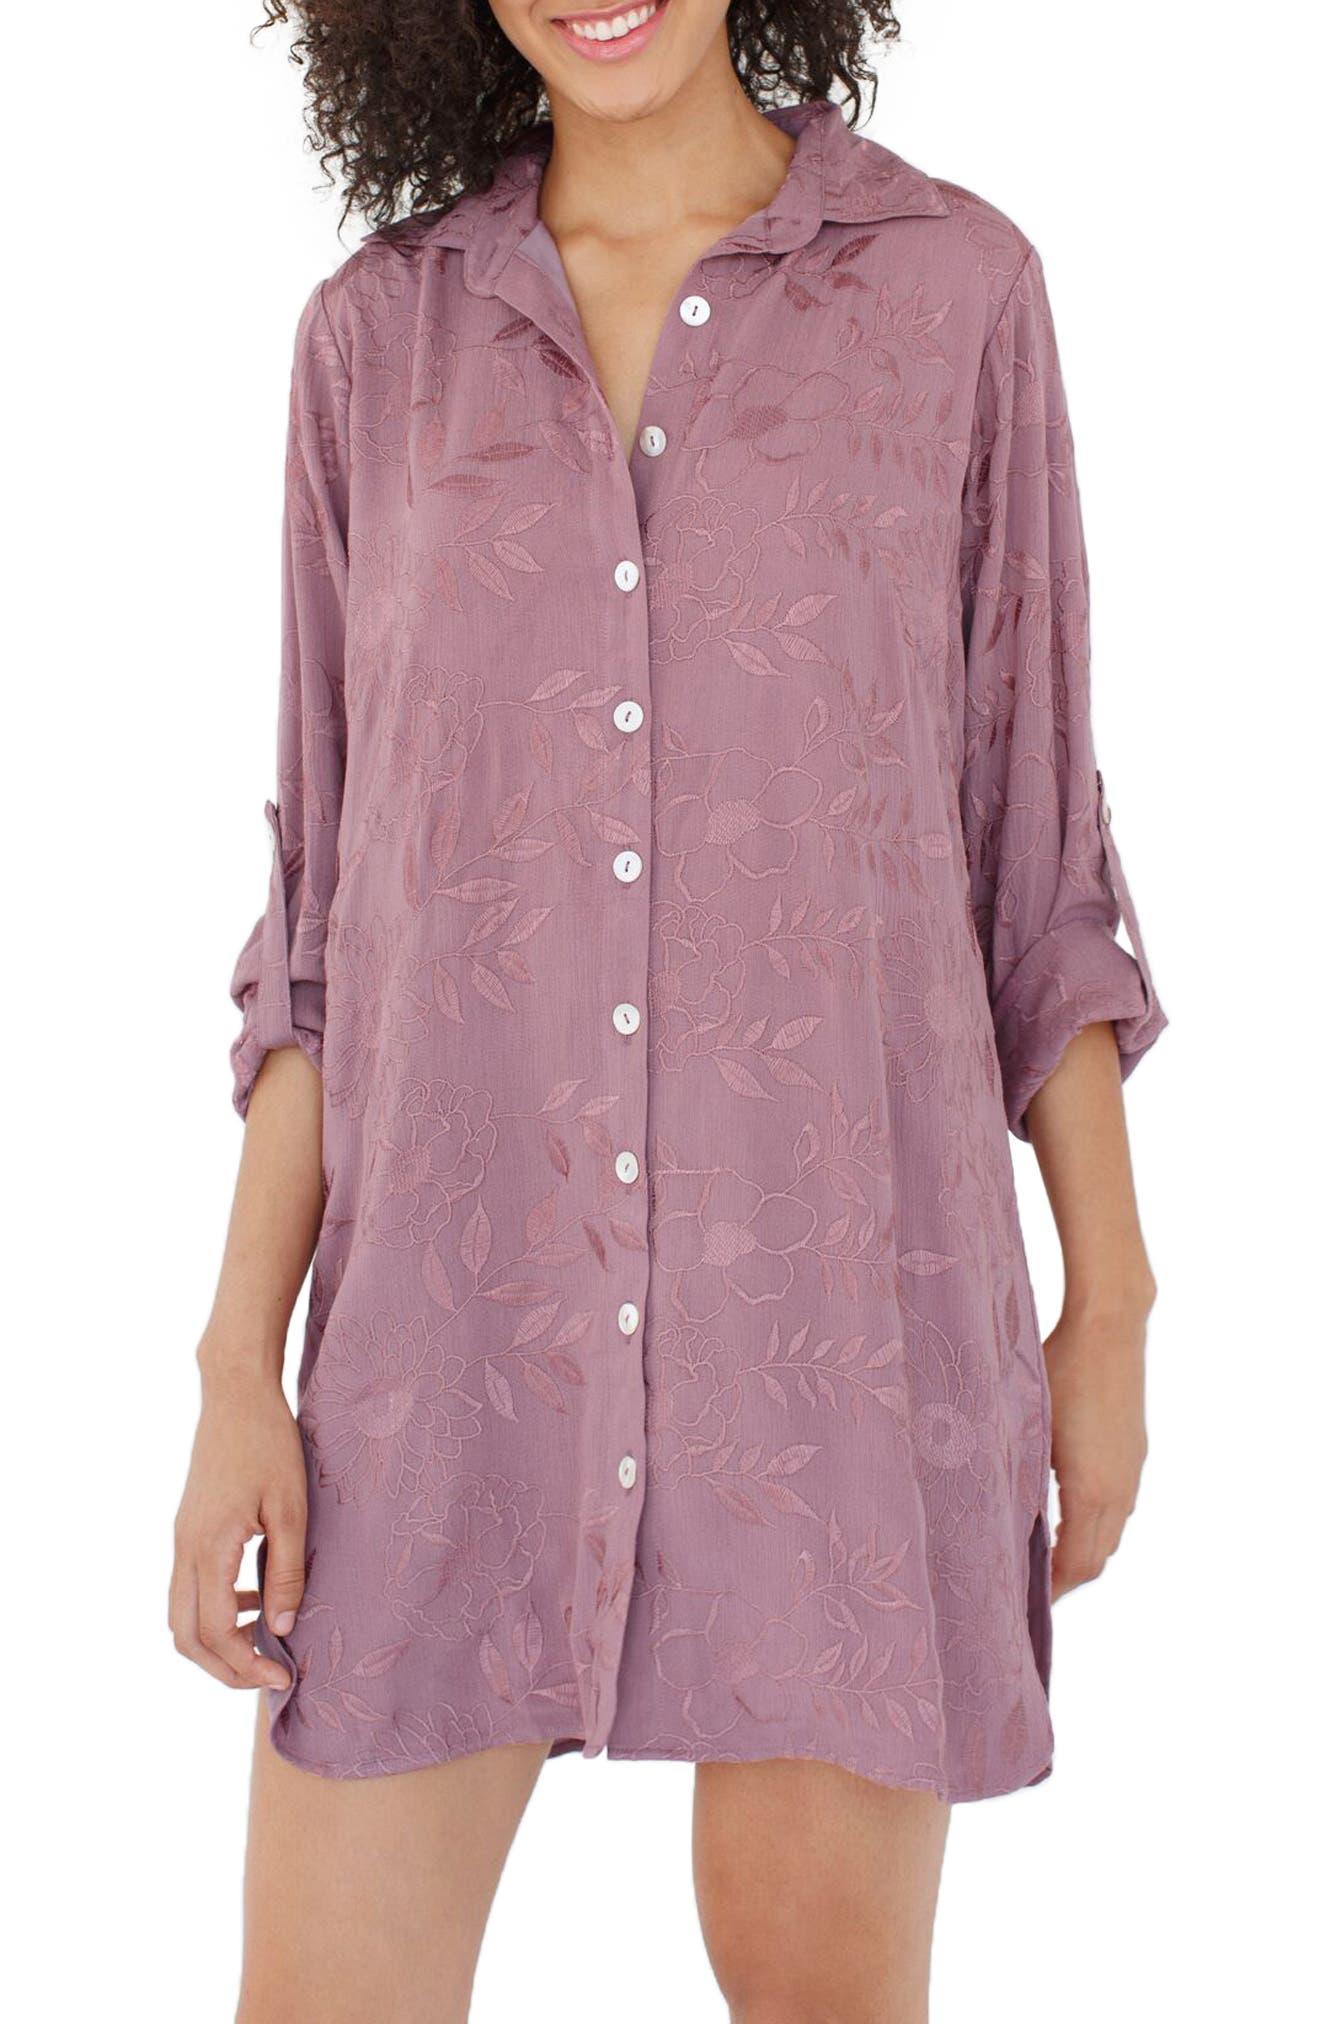 Main Image - Plum Pretty Sugar Floral Embroidered Nightshirt